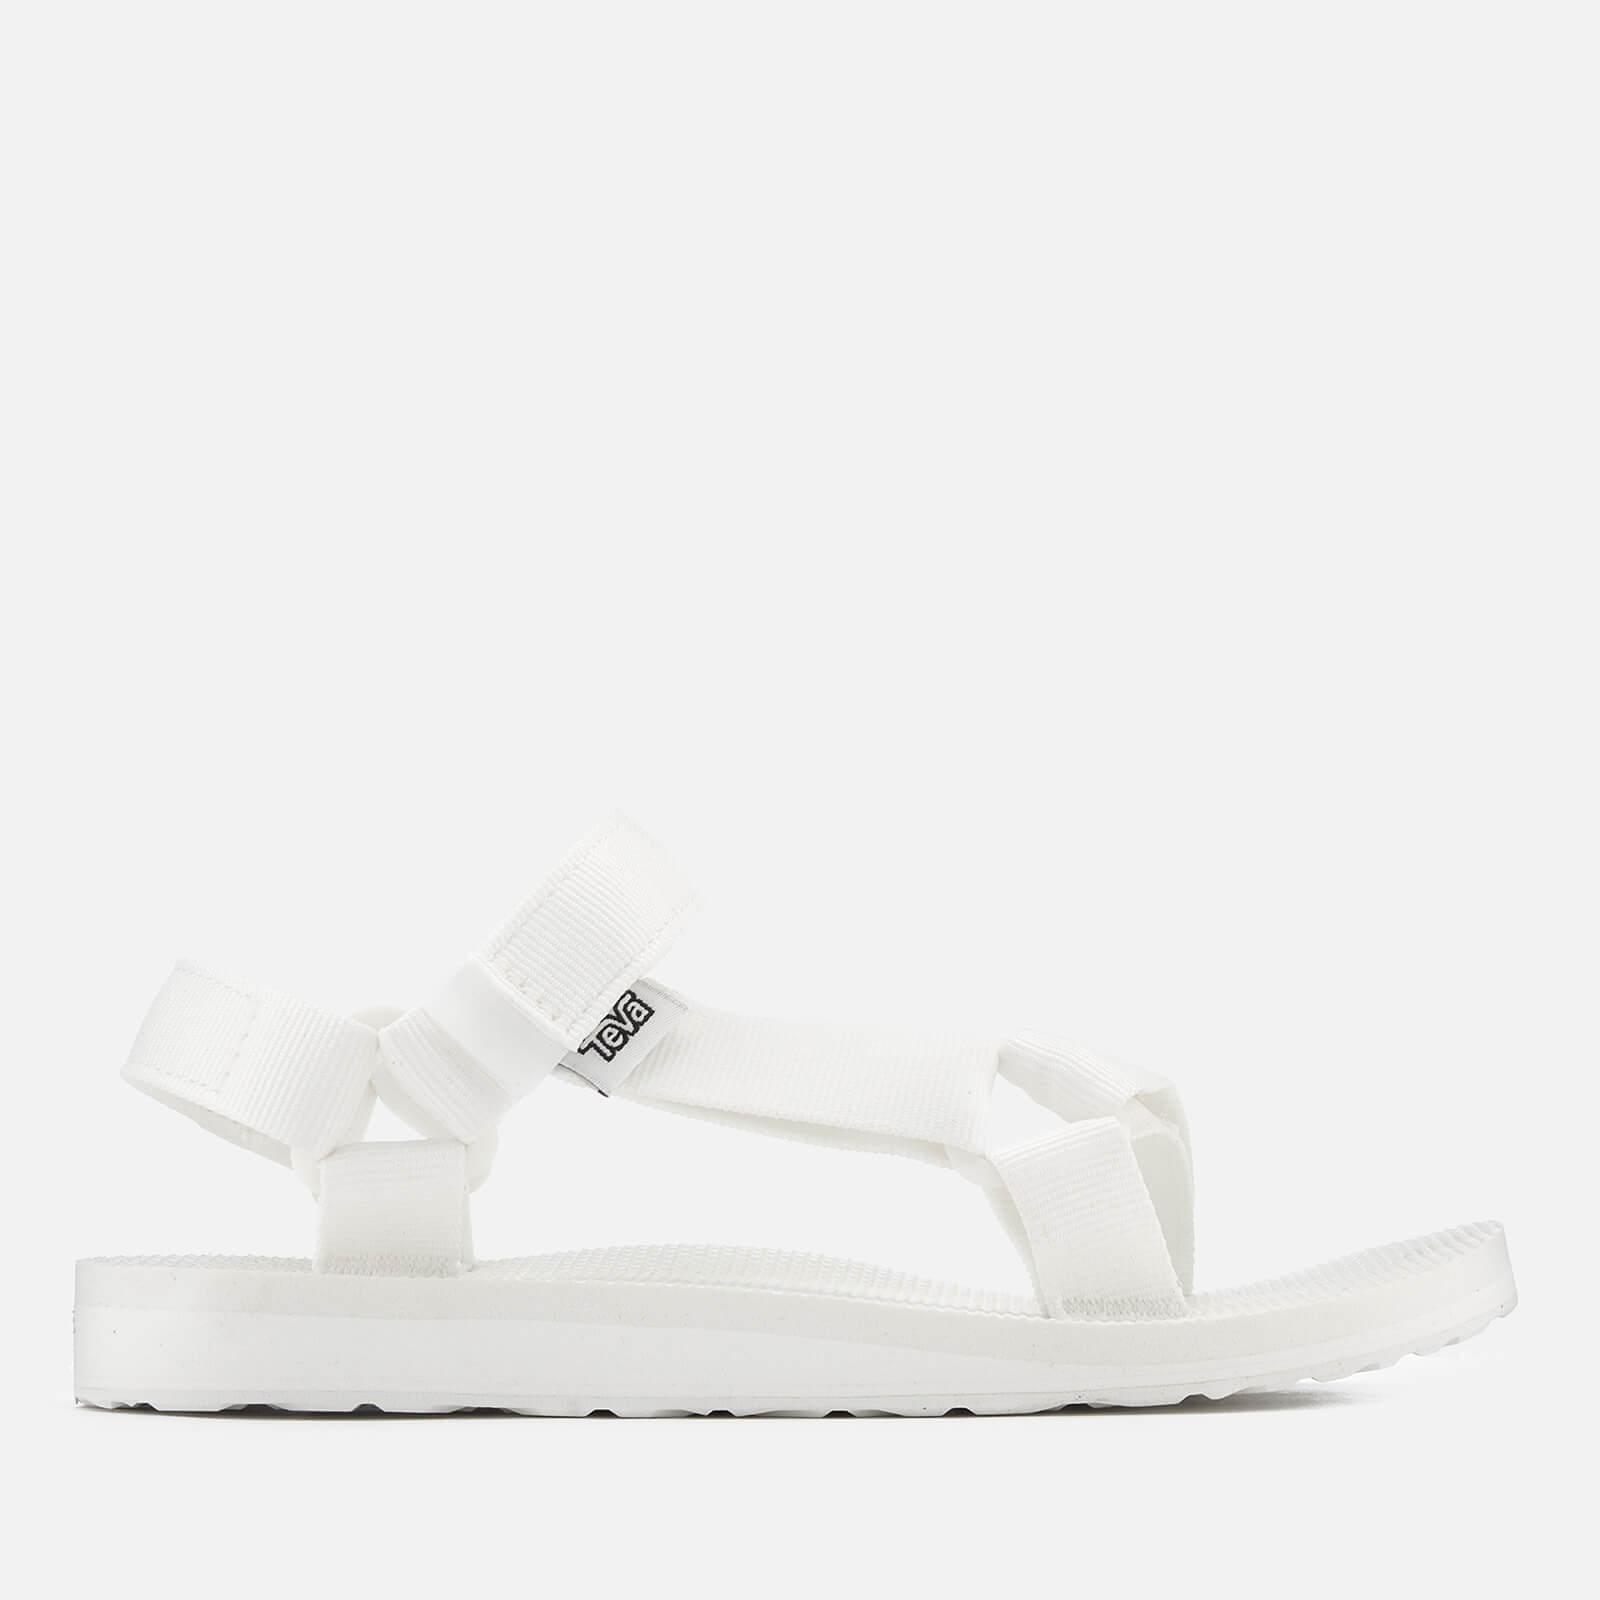 Teva Women's Original Universal Sport Sandals - Bright White - UK 3